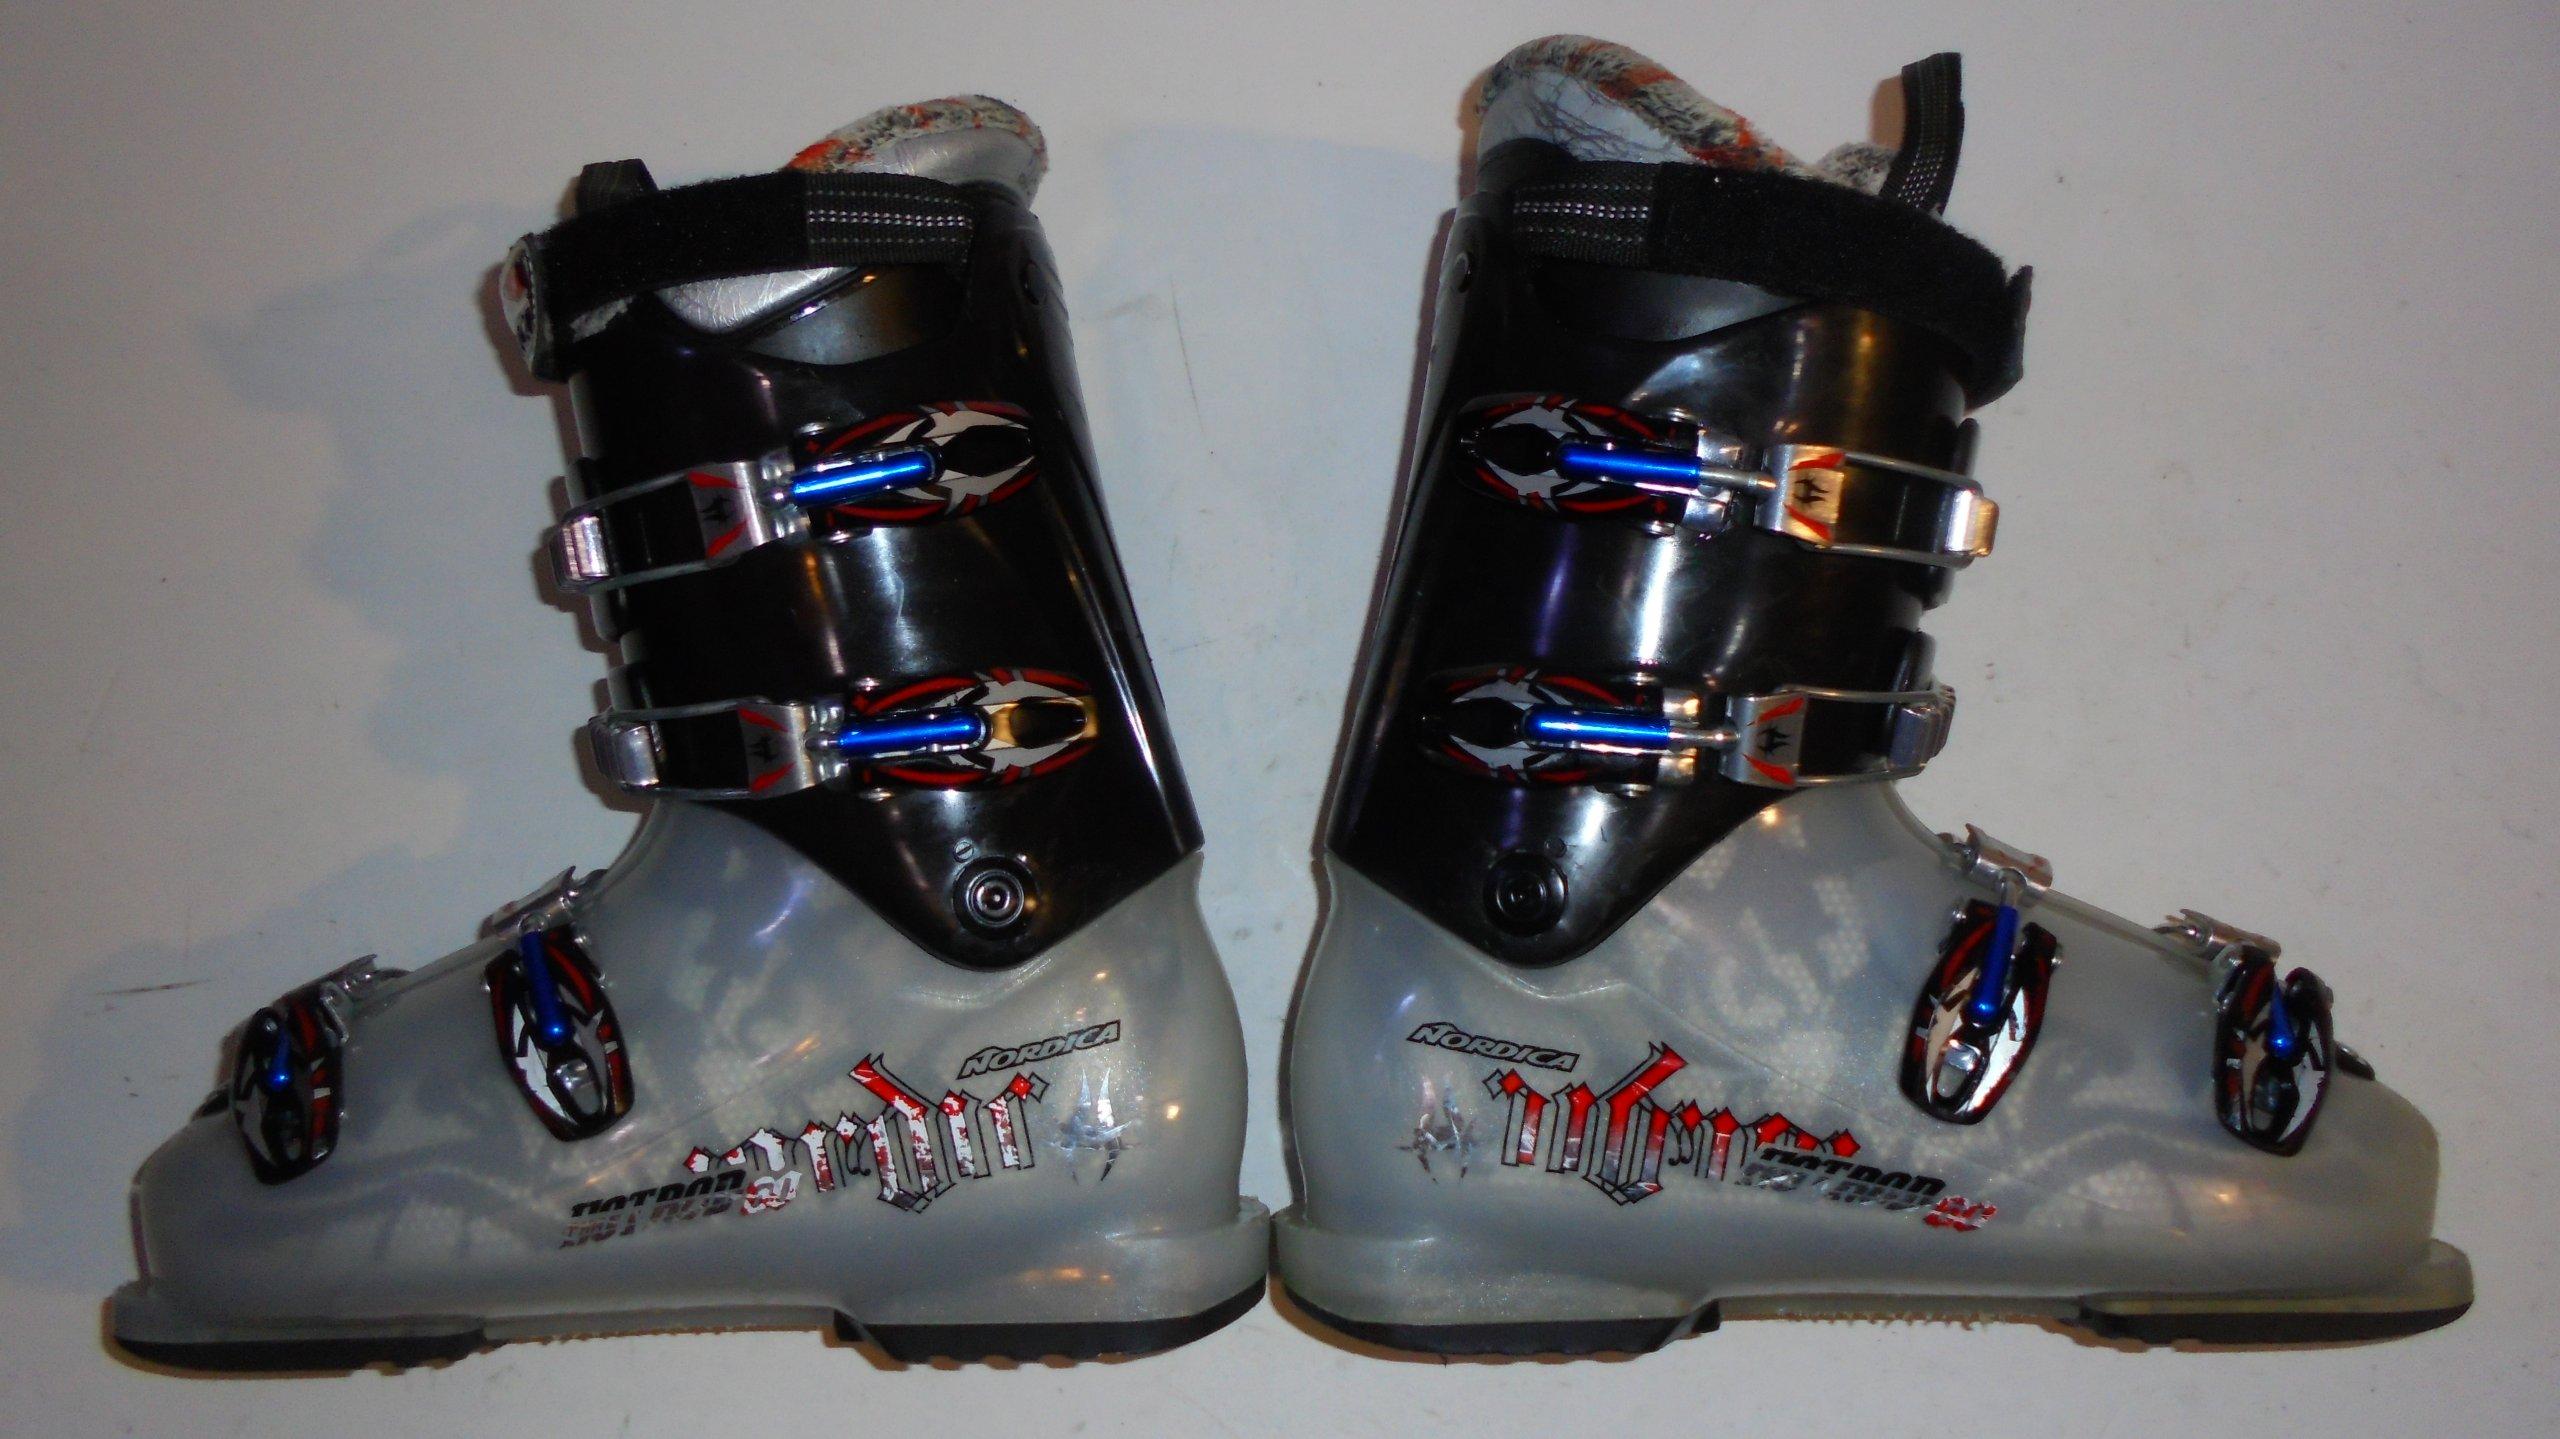 Buty narciarskie NORDICA HOT ROD 60 roz 26,5 (41)